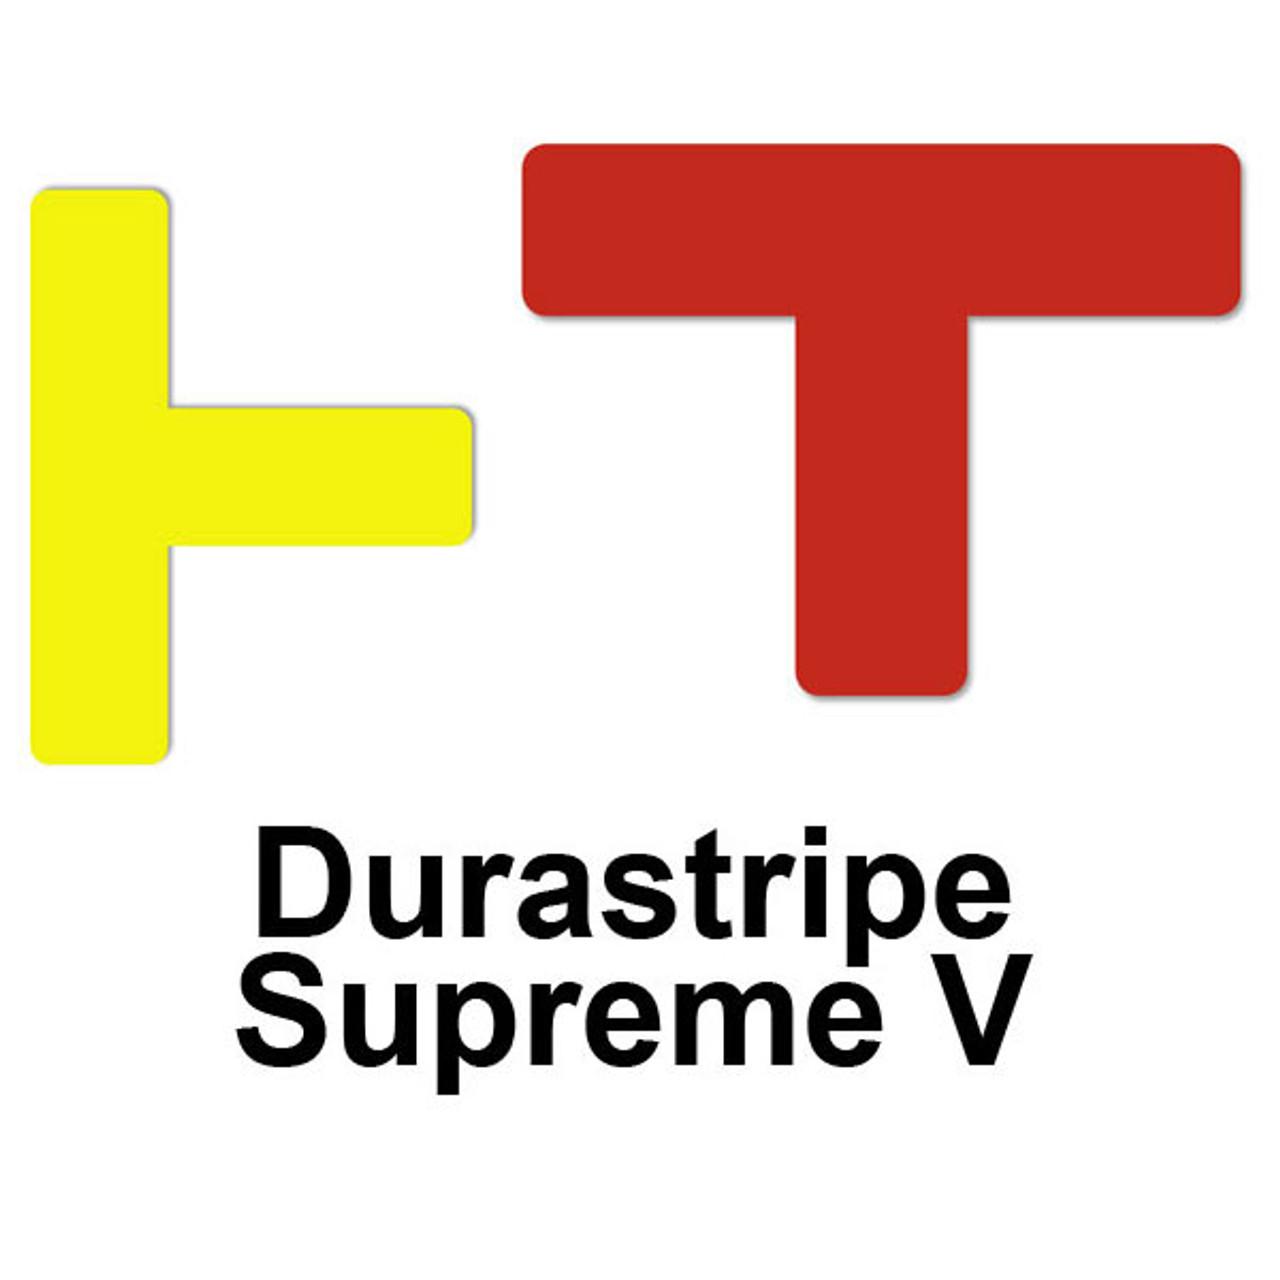 Durastripe Supreme V Rounded T's